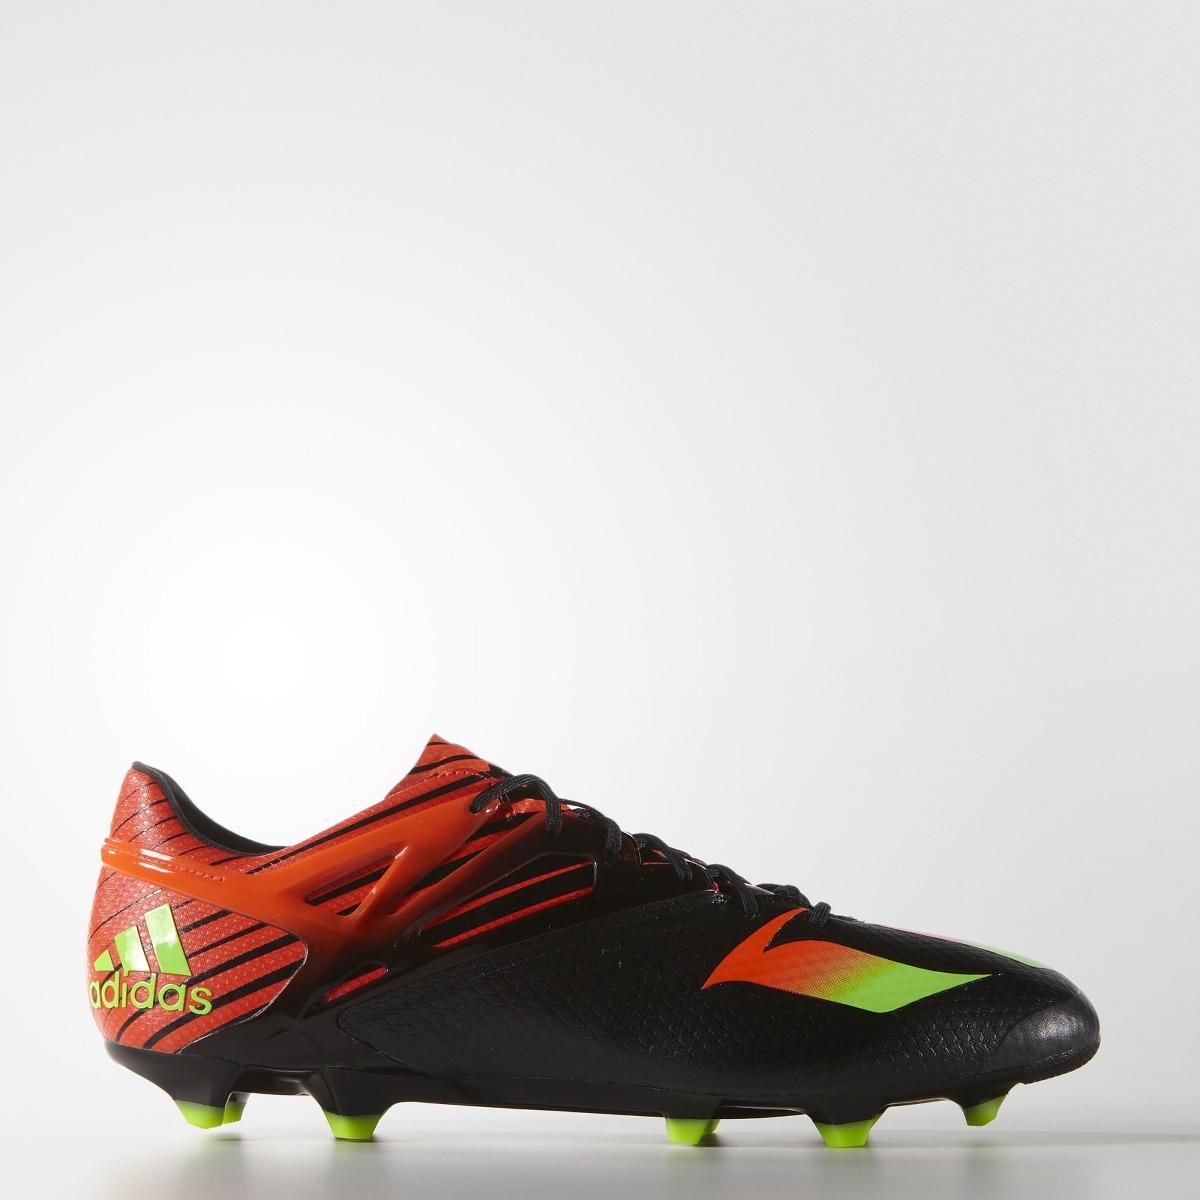 Chuteira adidas Messi 15.1 Fg - Campo - Profissional - R  279 c58f8c358a945